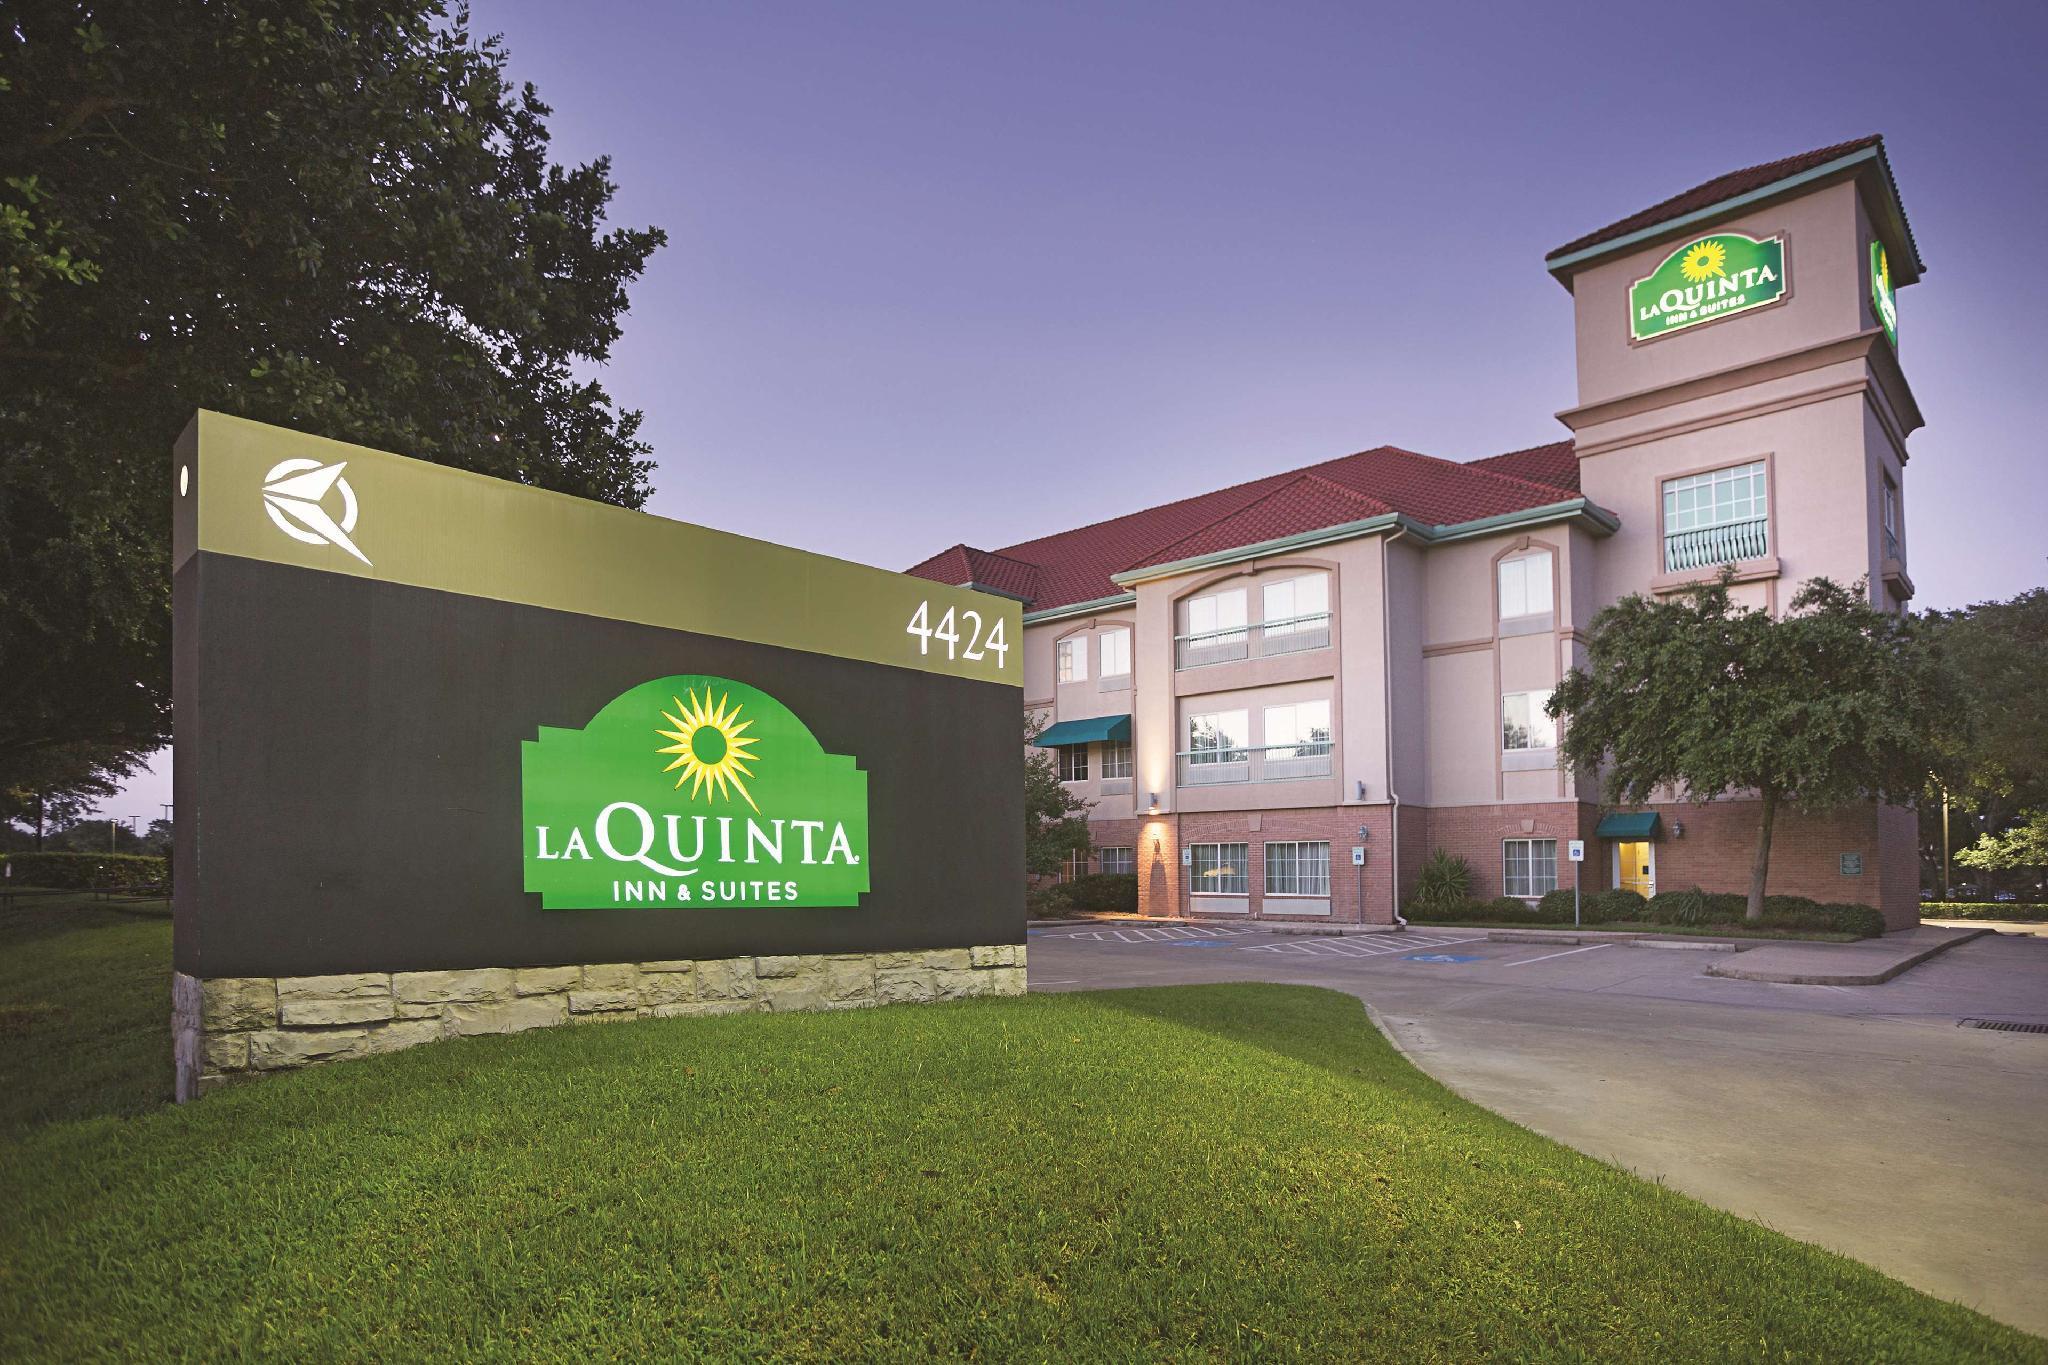 La Quinta Inn & Suites By Wyndham Houston West At Clay Road